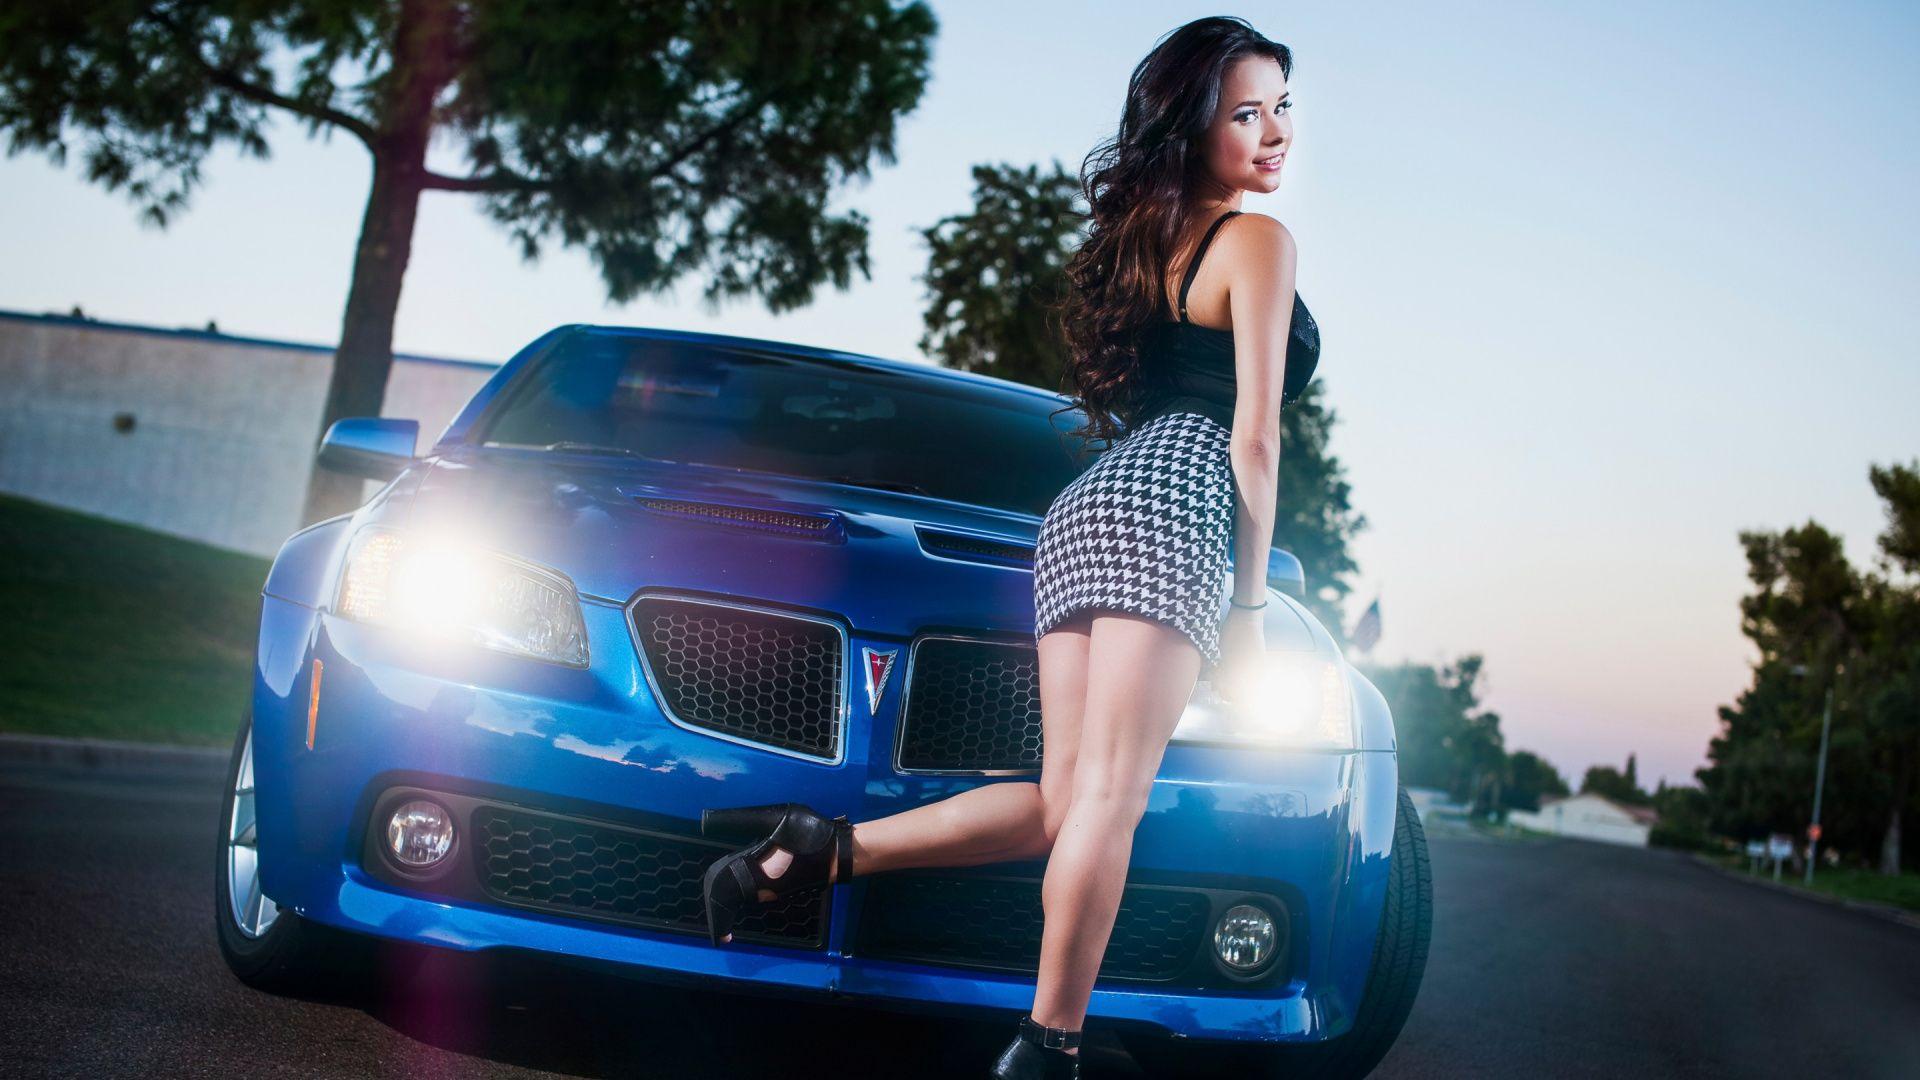 Car Girl desktop wallpaper